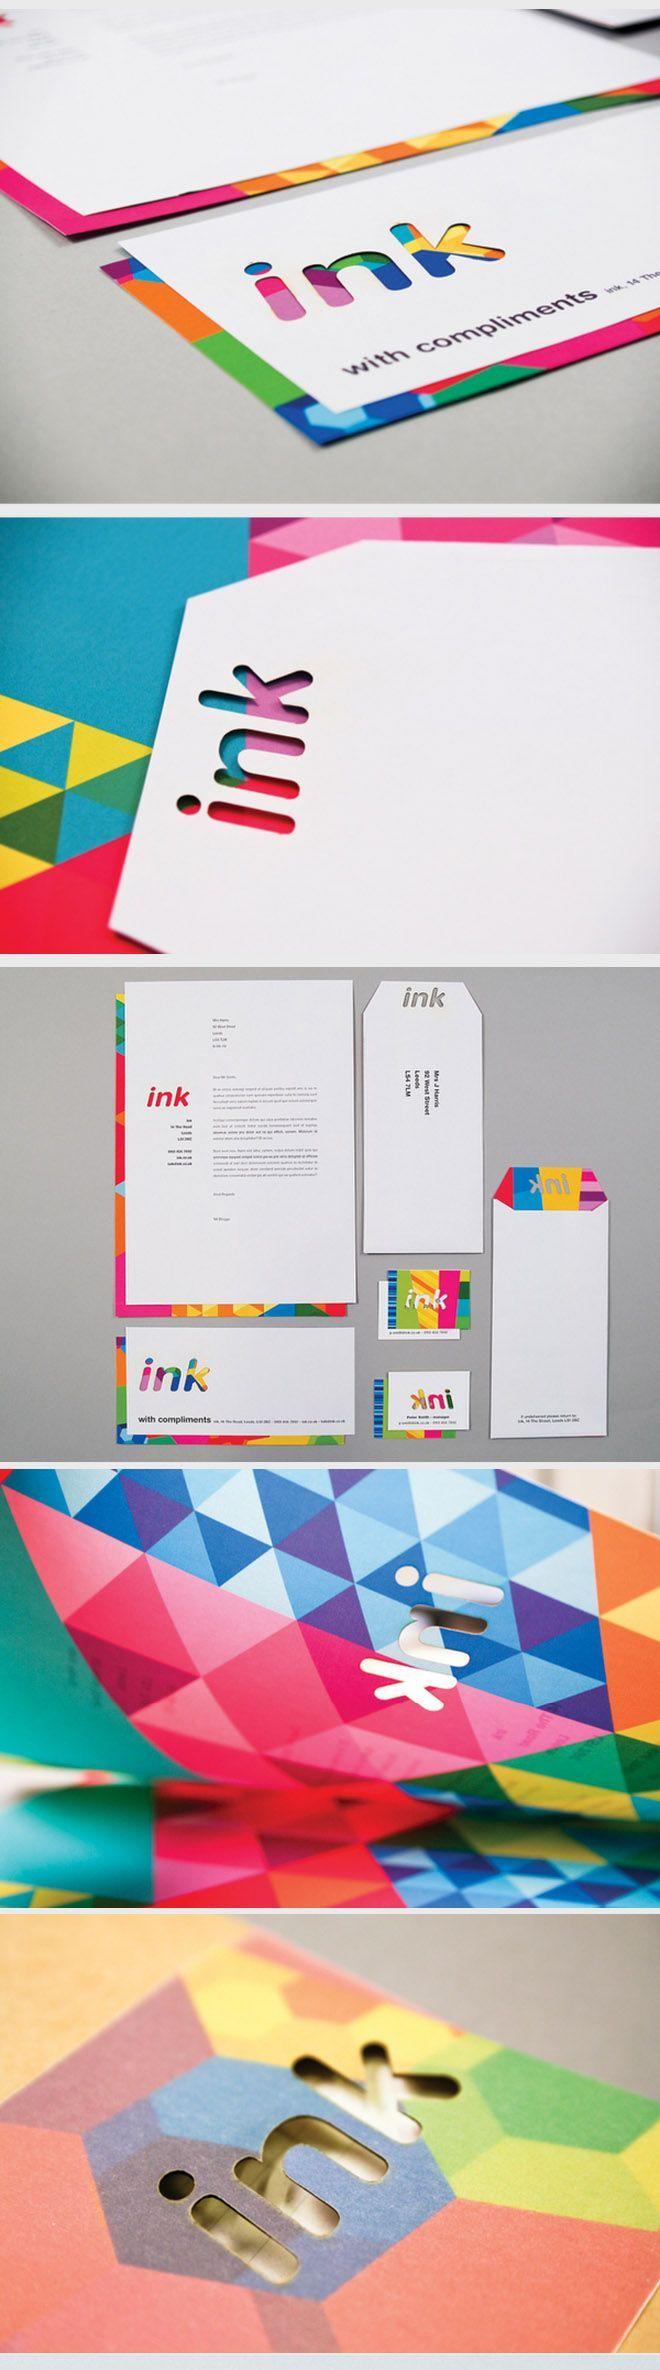 35 Creative and Beautiful Branding Identity Design examples. Follow us www.pinterest.com...